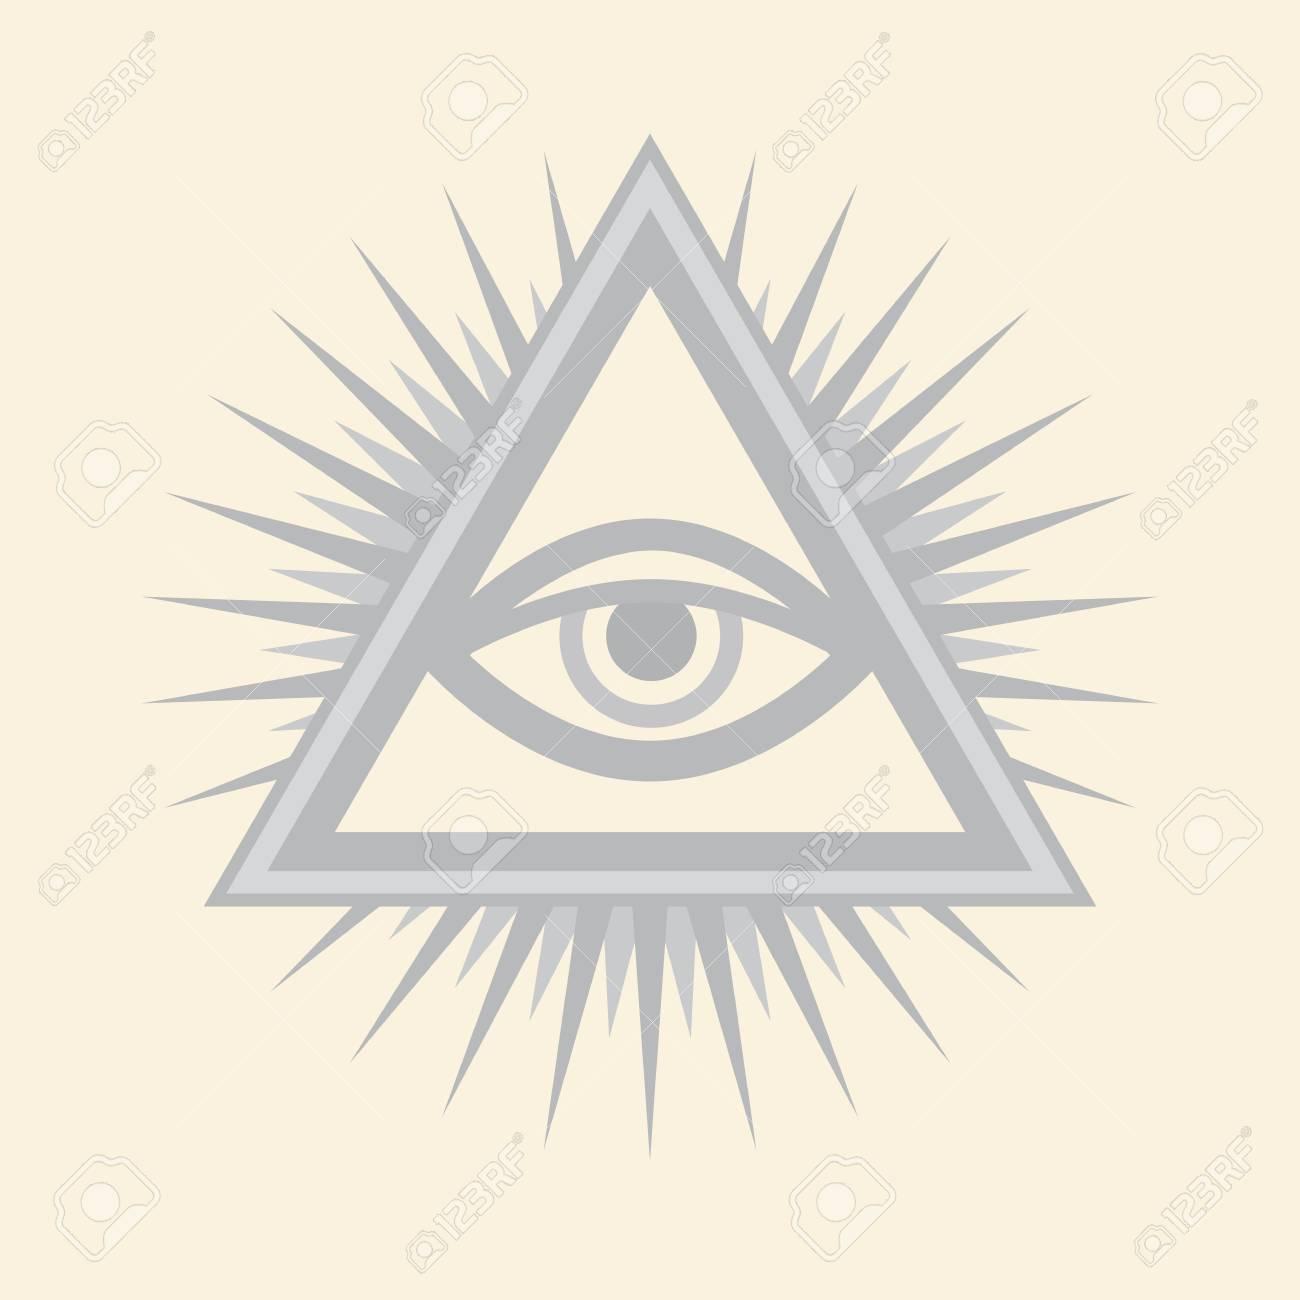 Freemason Flyers Logo Mersnoforum